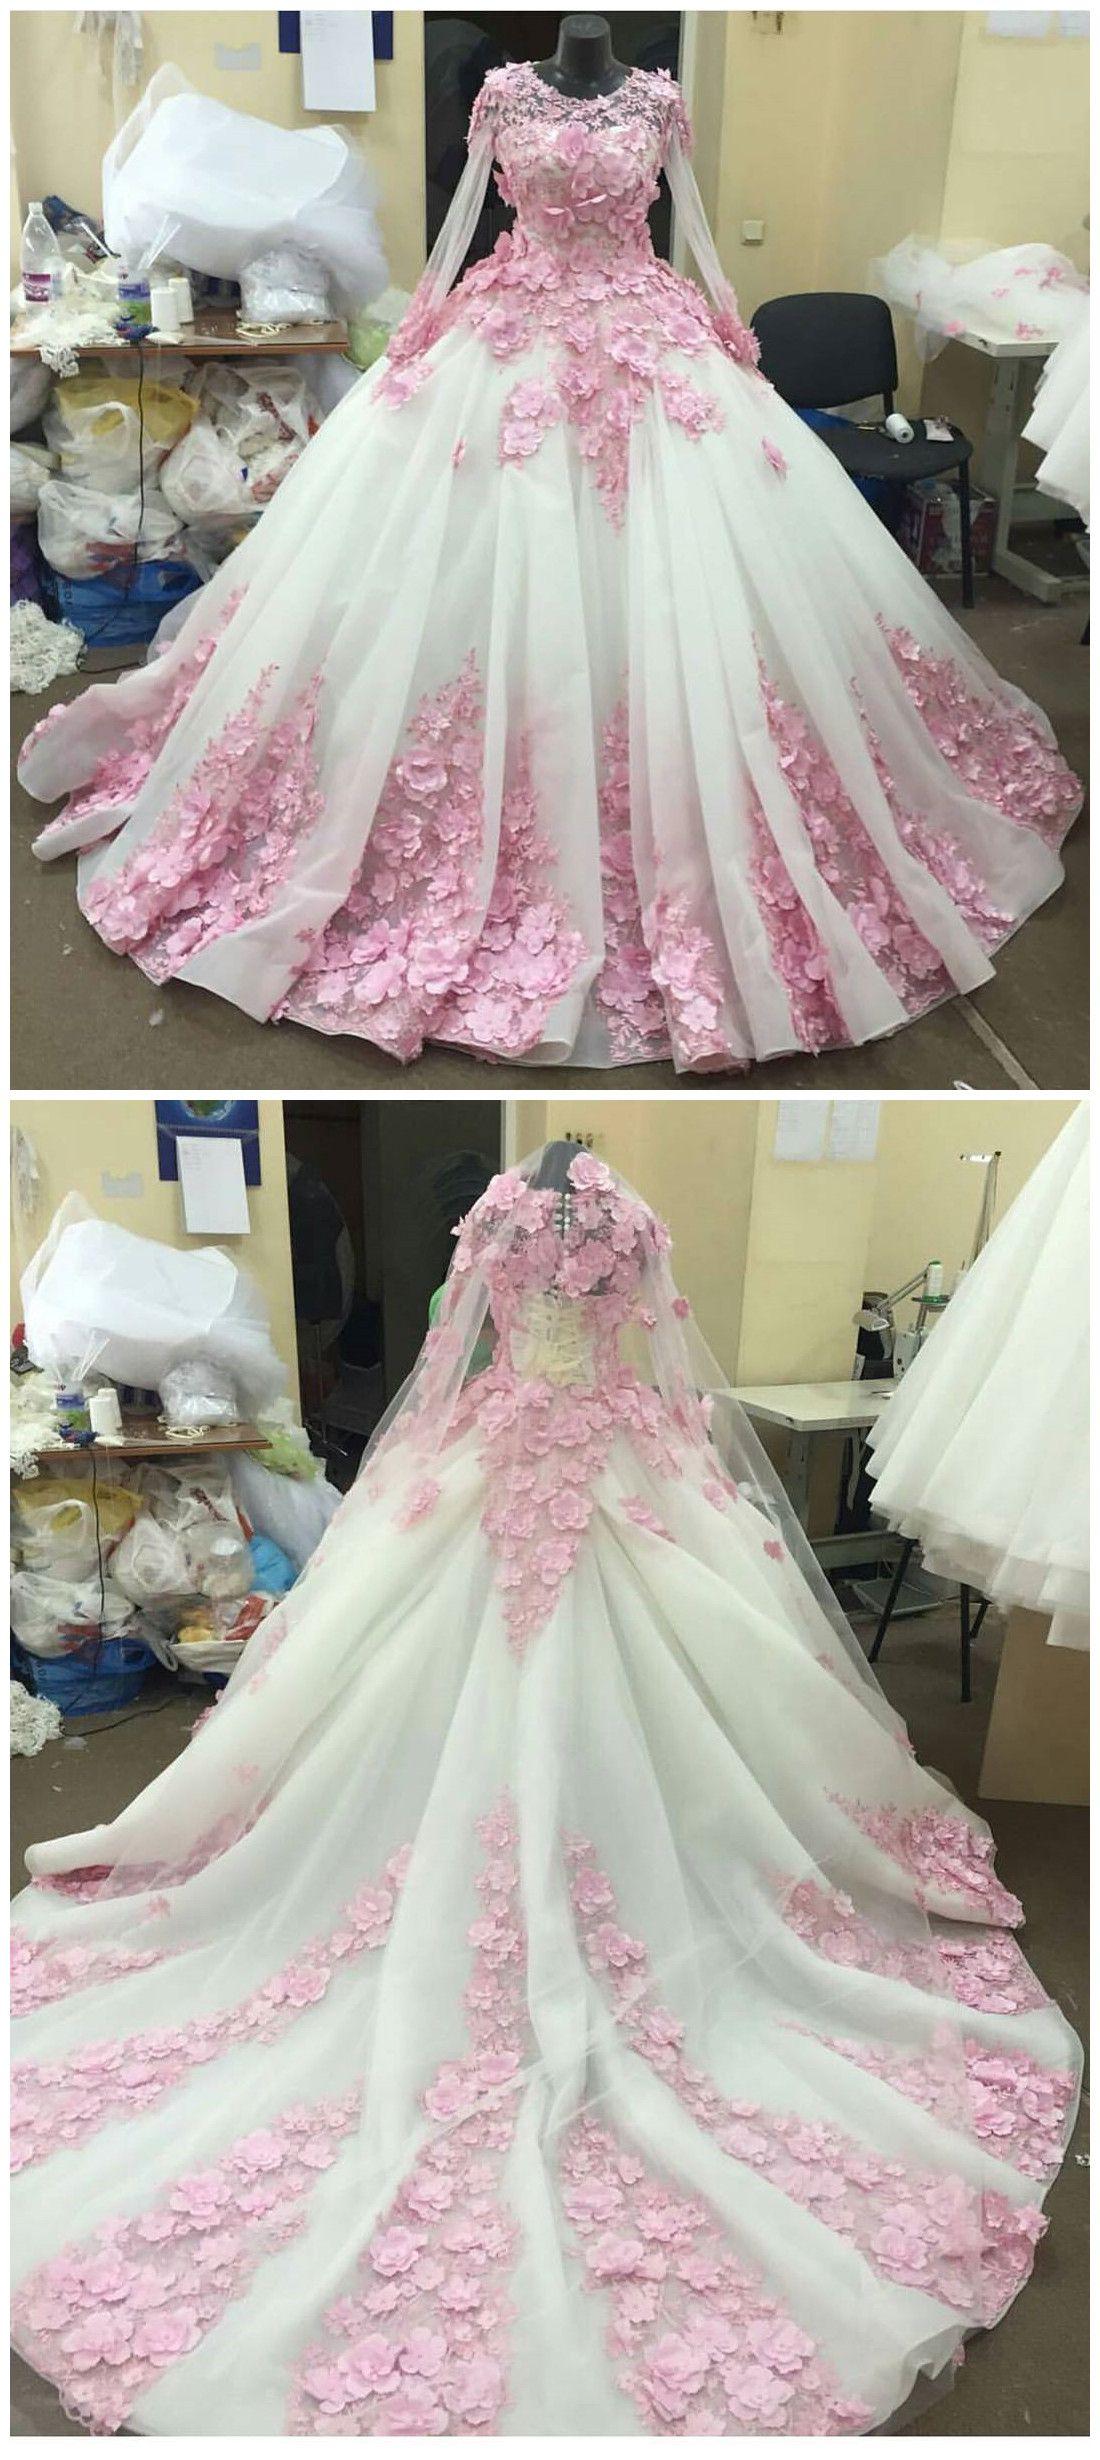 New Arrival Prom Dressmodest Prom Dressflower Wedding Dresspink